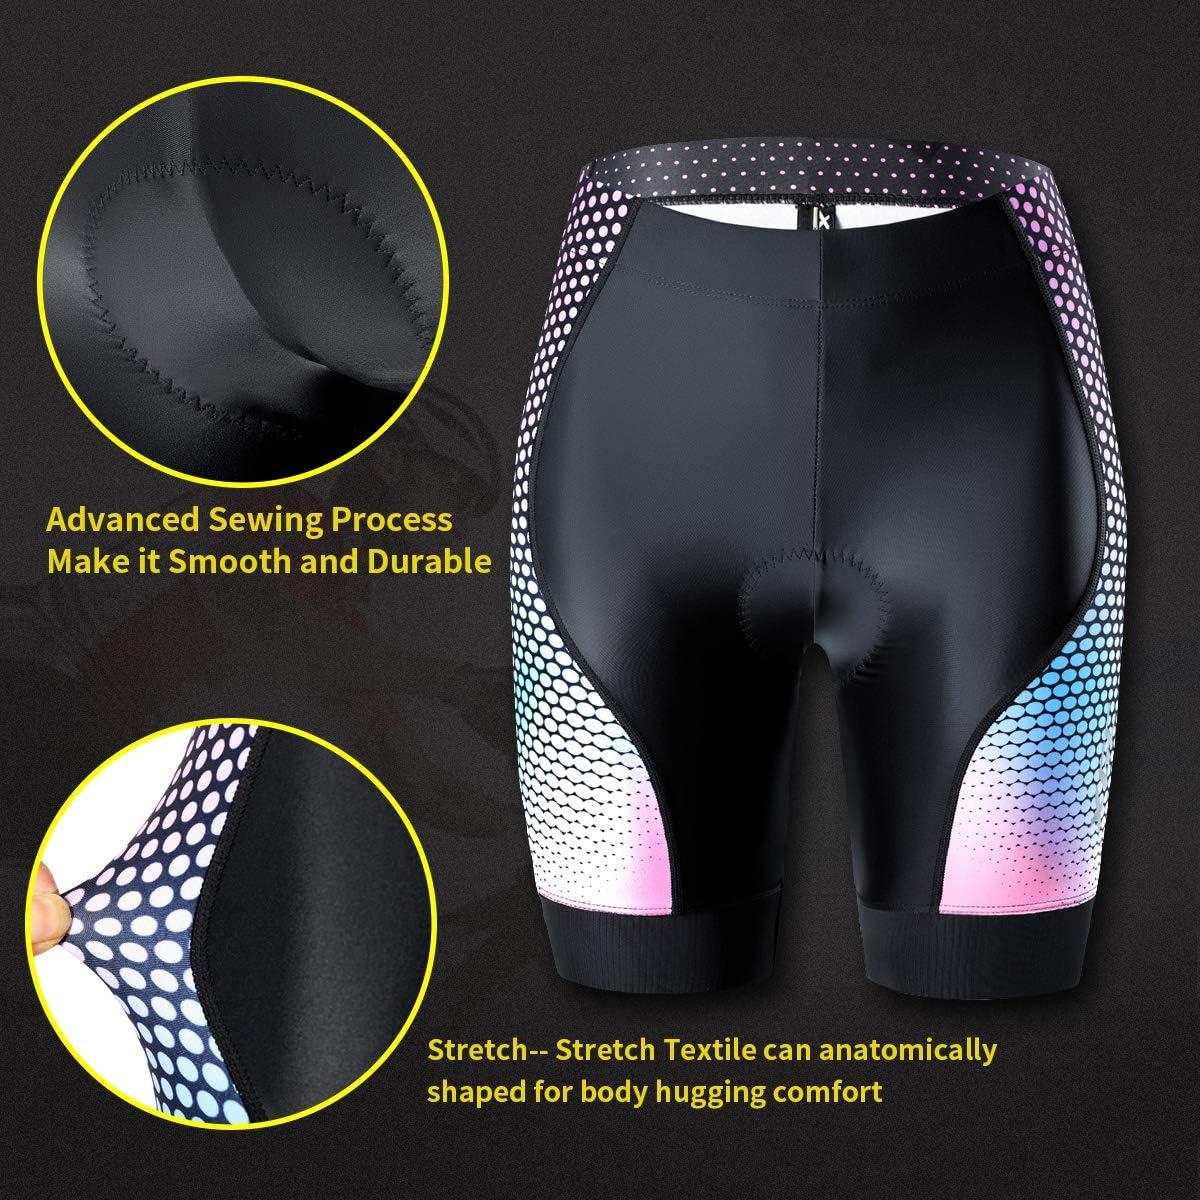 ad asciugatura rapida con imbottitura in spugna 4D ad alta densit/à Pantaloncini da ciclismo da donna ad alta elasticit/à e altamente traspirante XGC